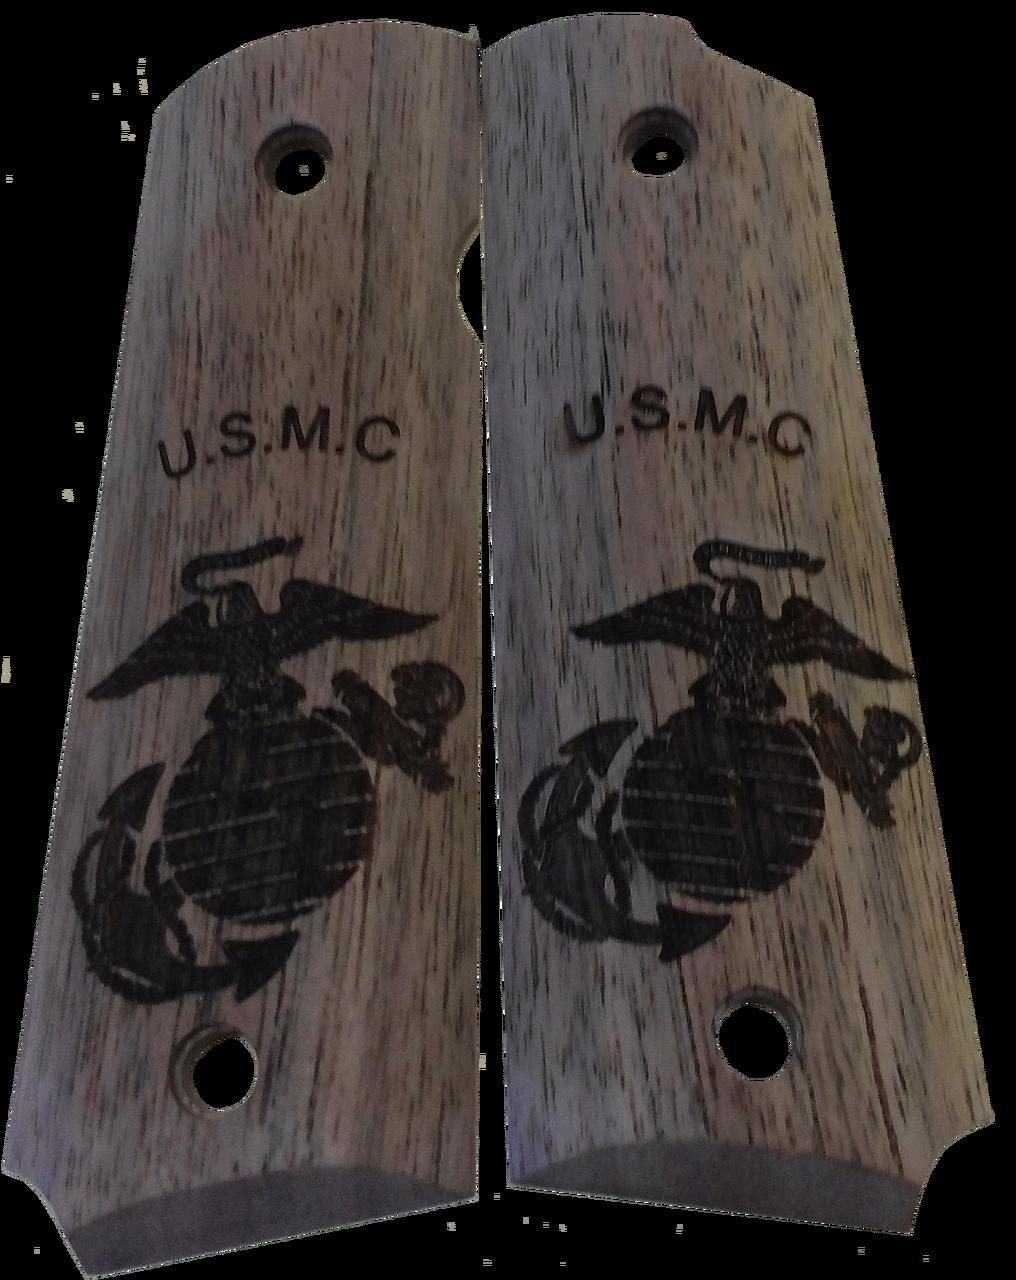 1911 Pistol Grips USMC Engraved